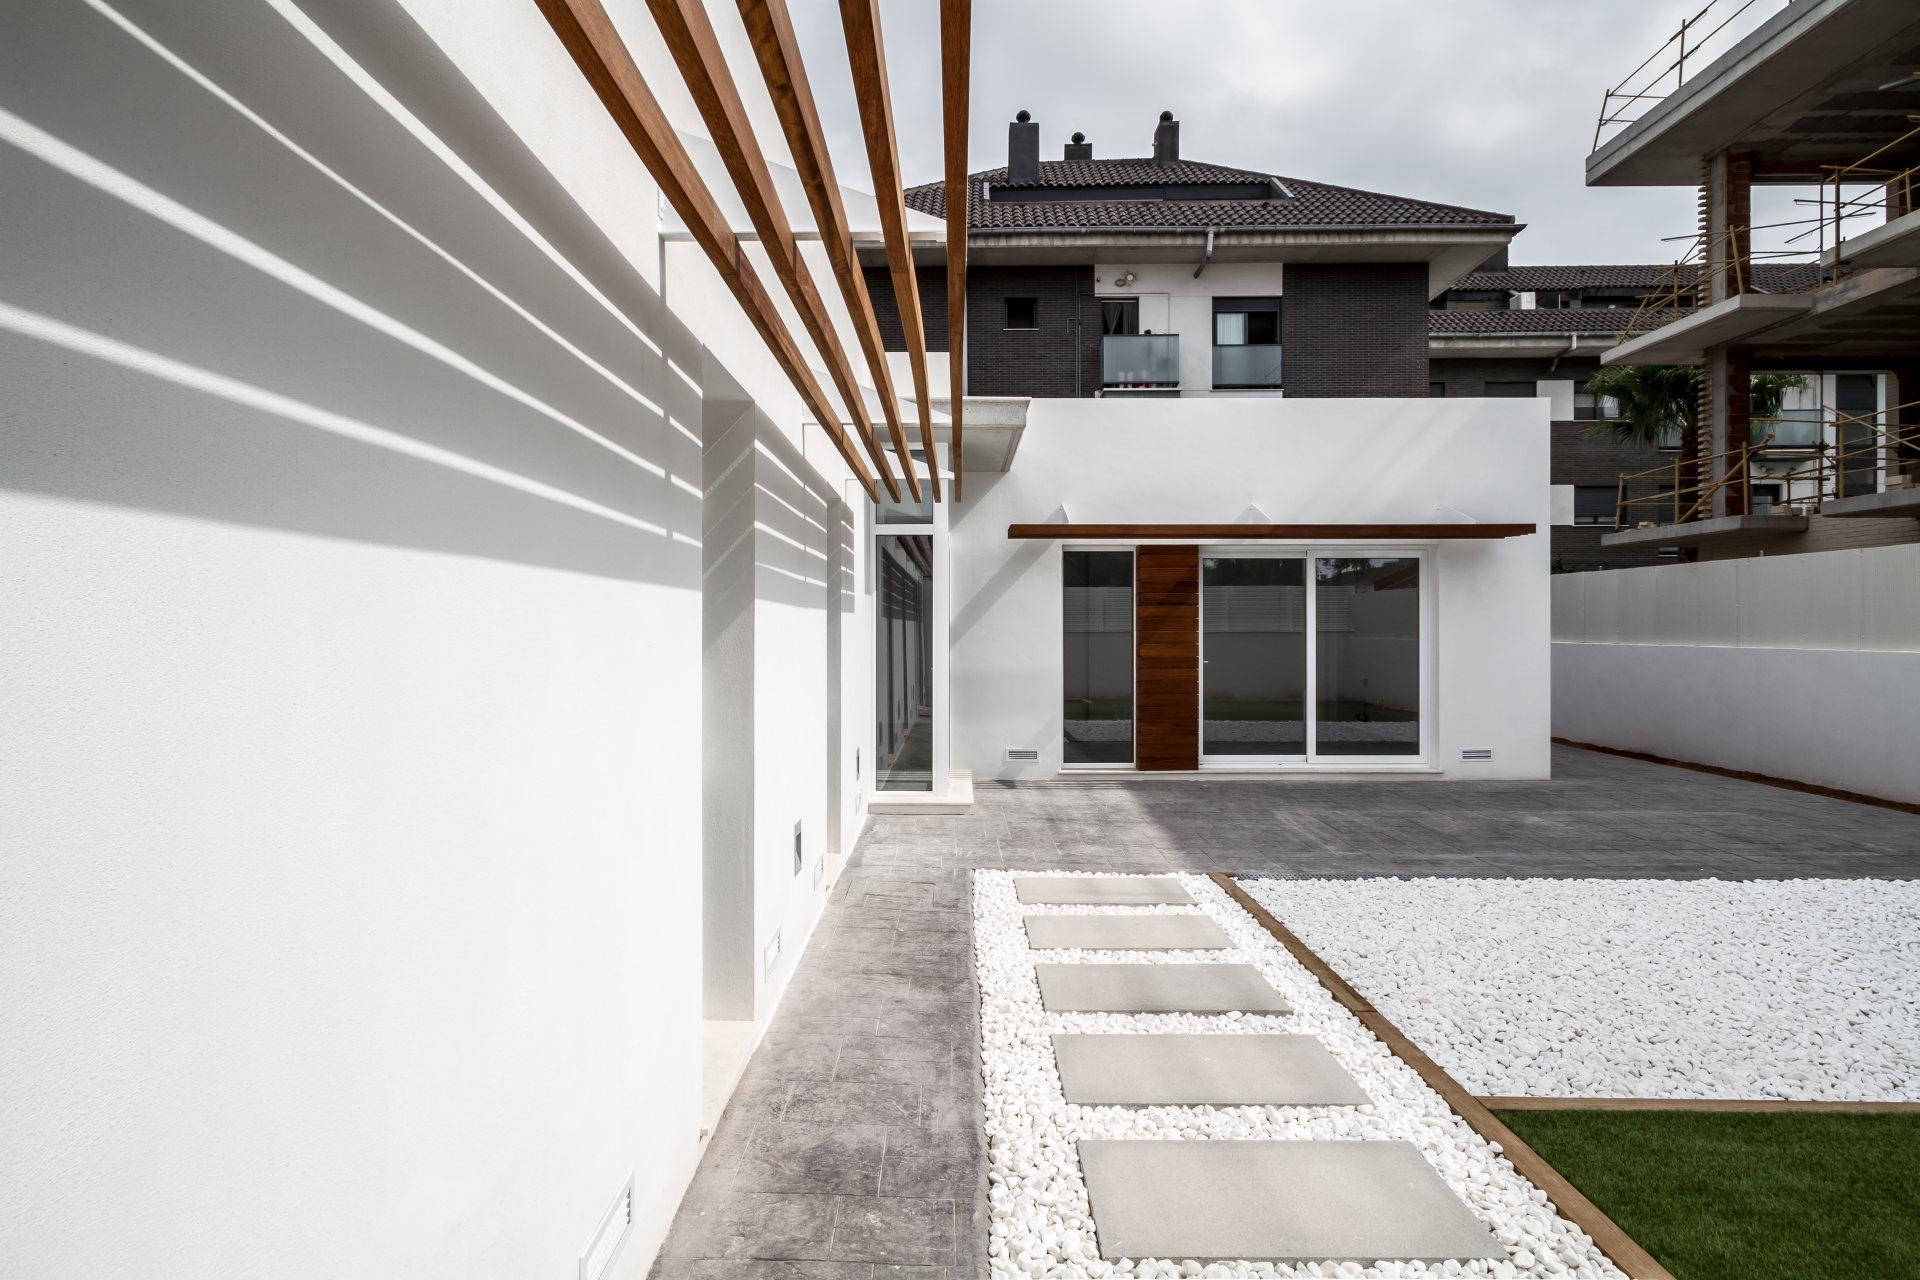 fotografia-arquitectura-valencia-german-cabo-viraje-museros (22)